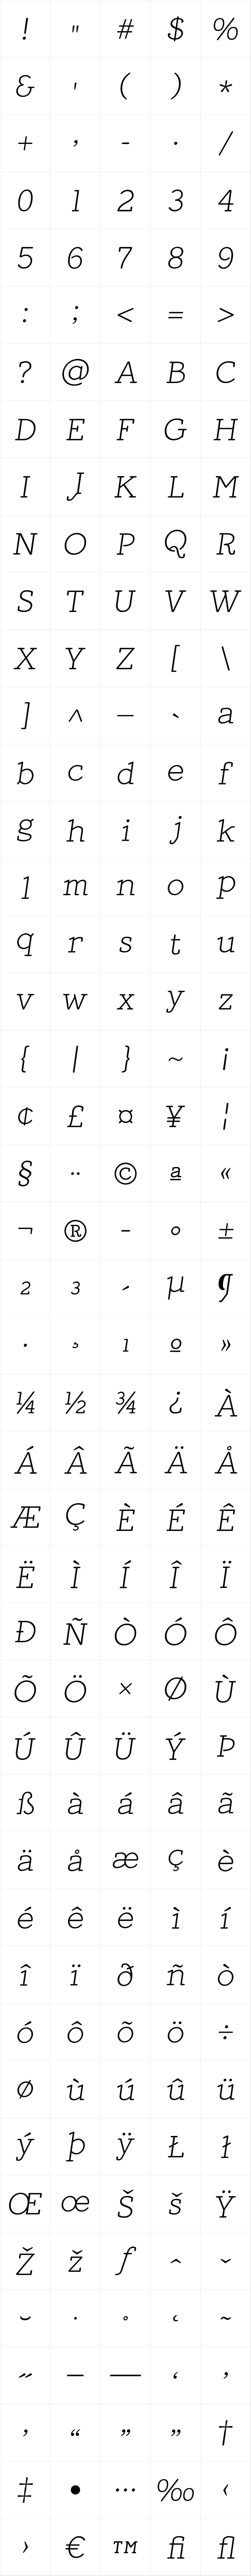 Mymra Forte Light Italic